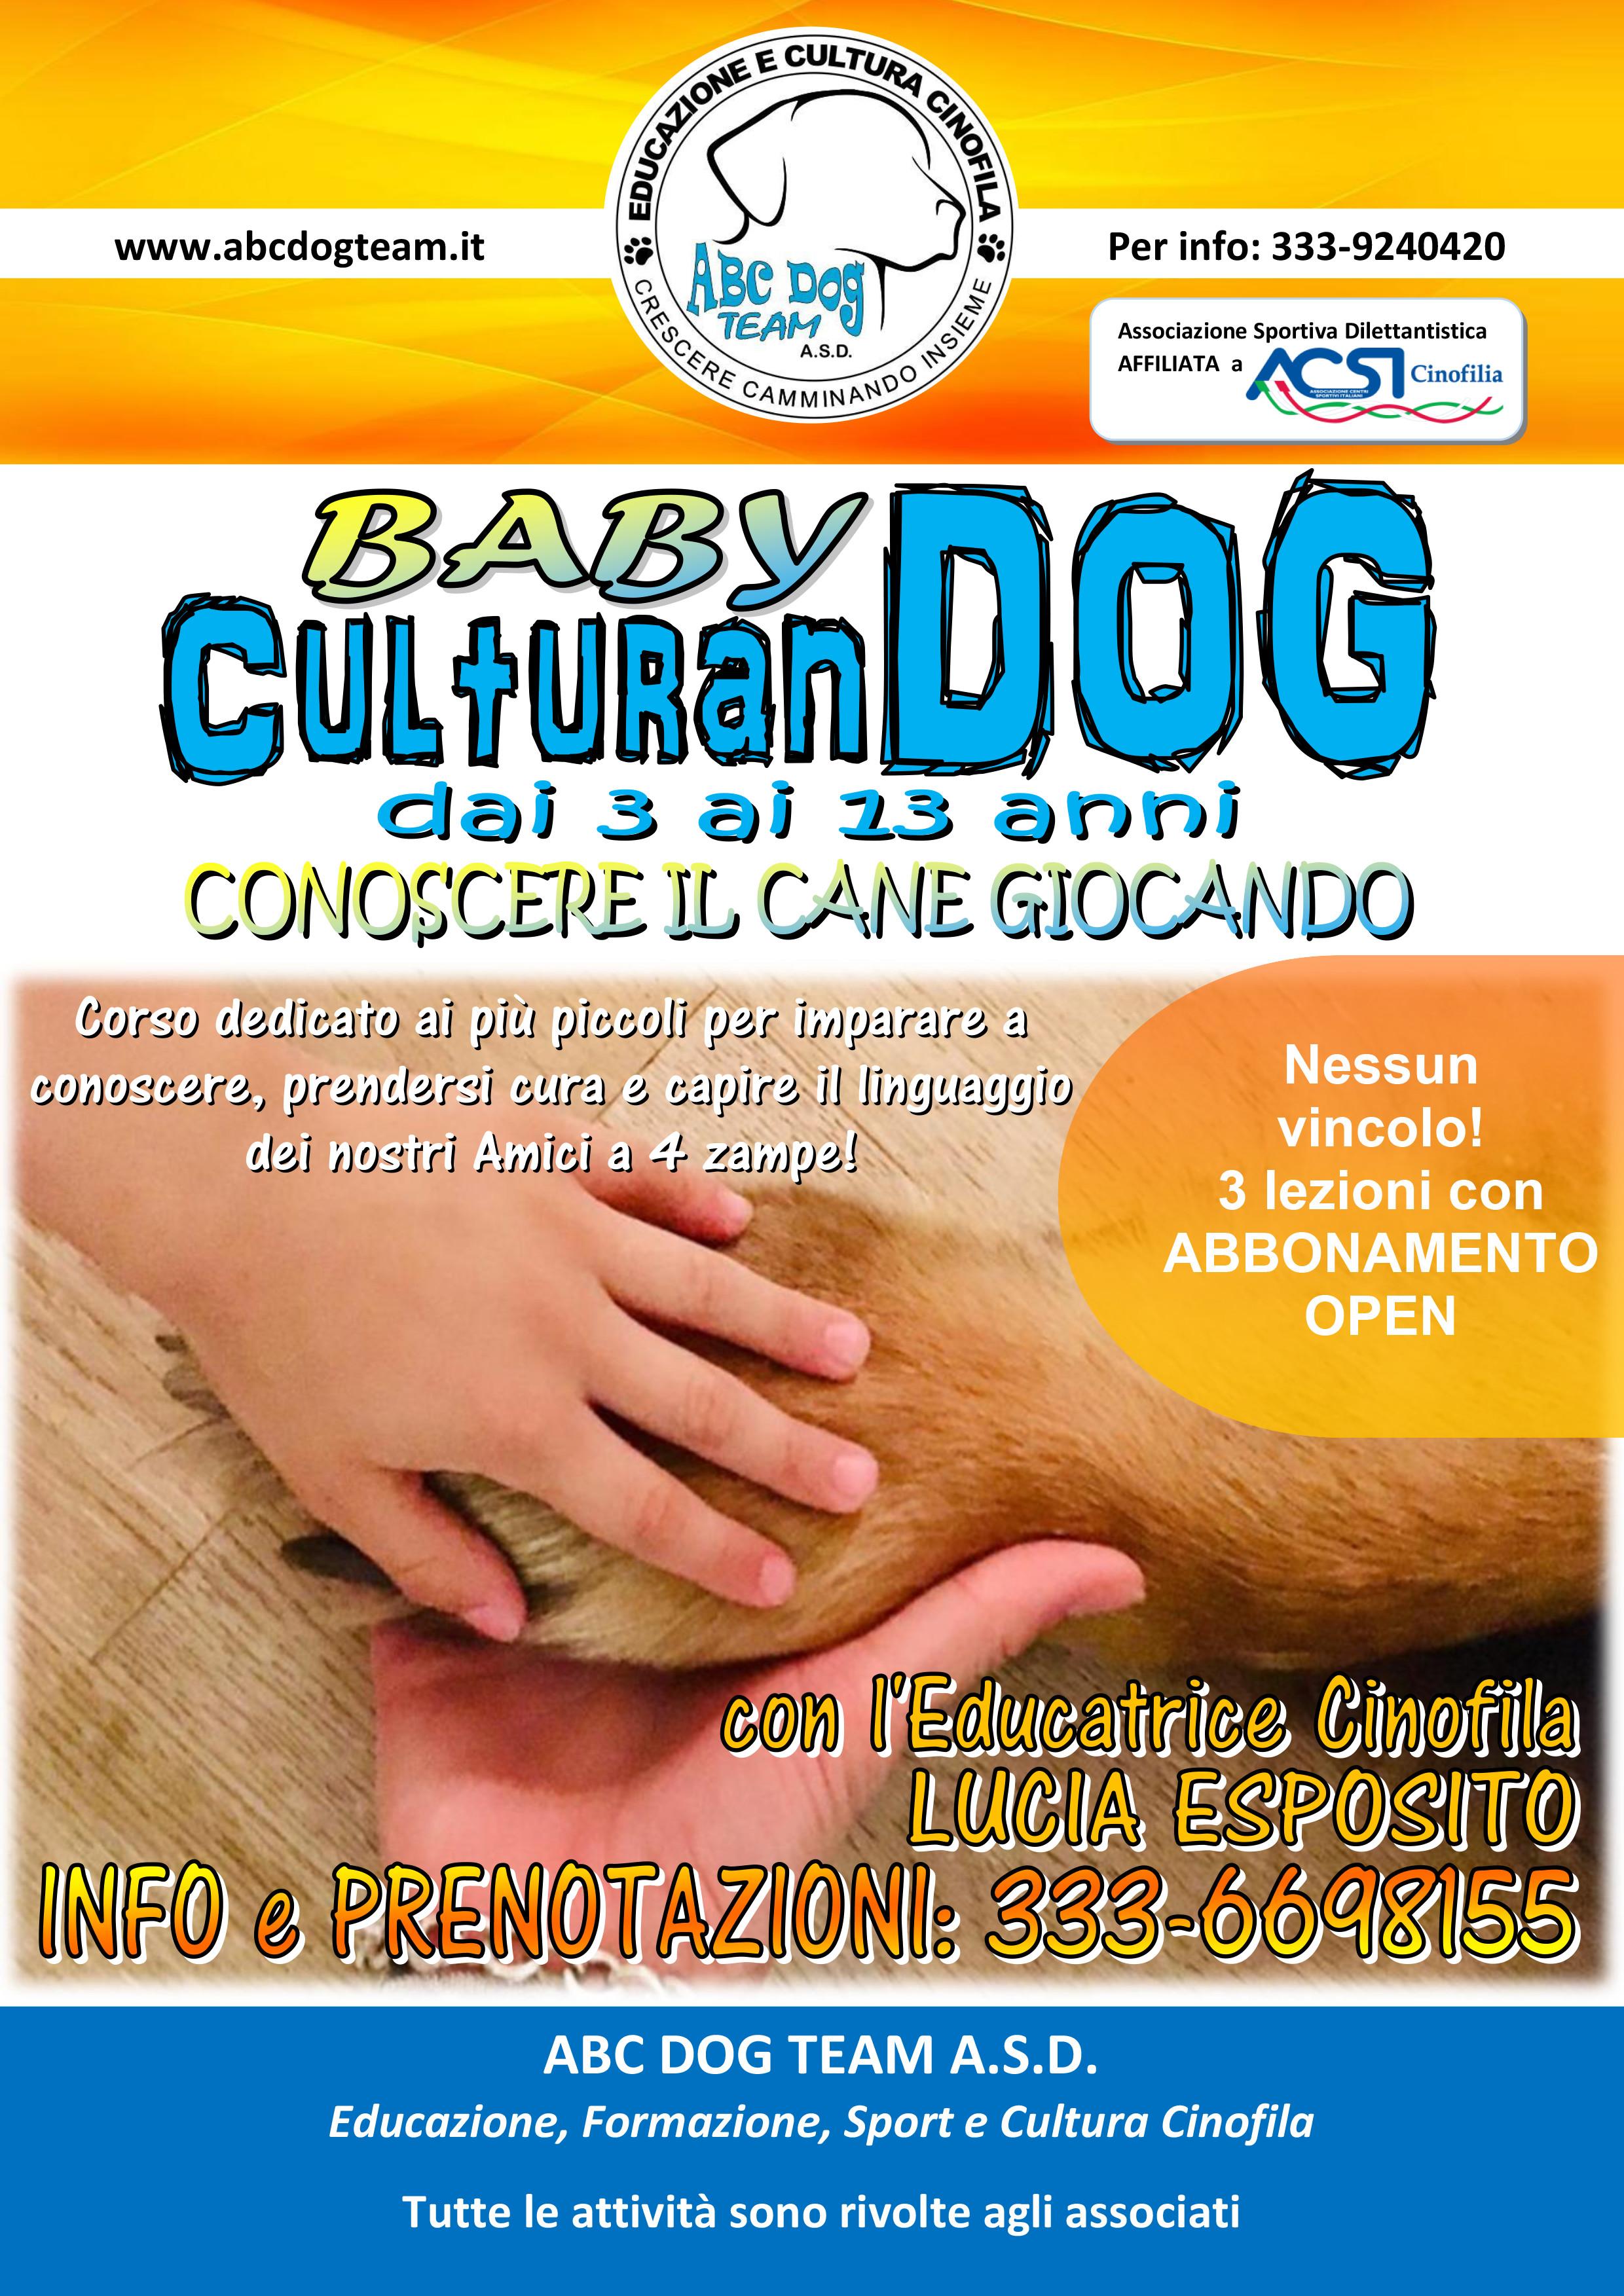 Locandina Baby CulturanDOG individuale NEW - 01.2019